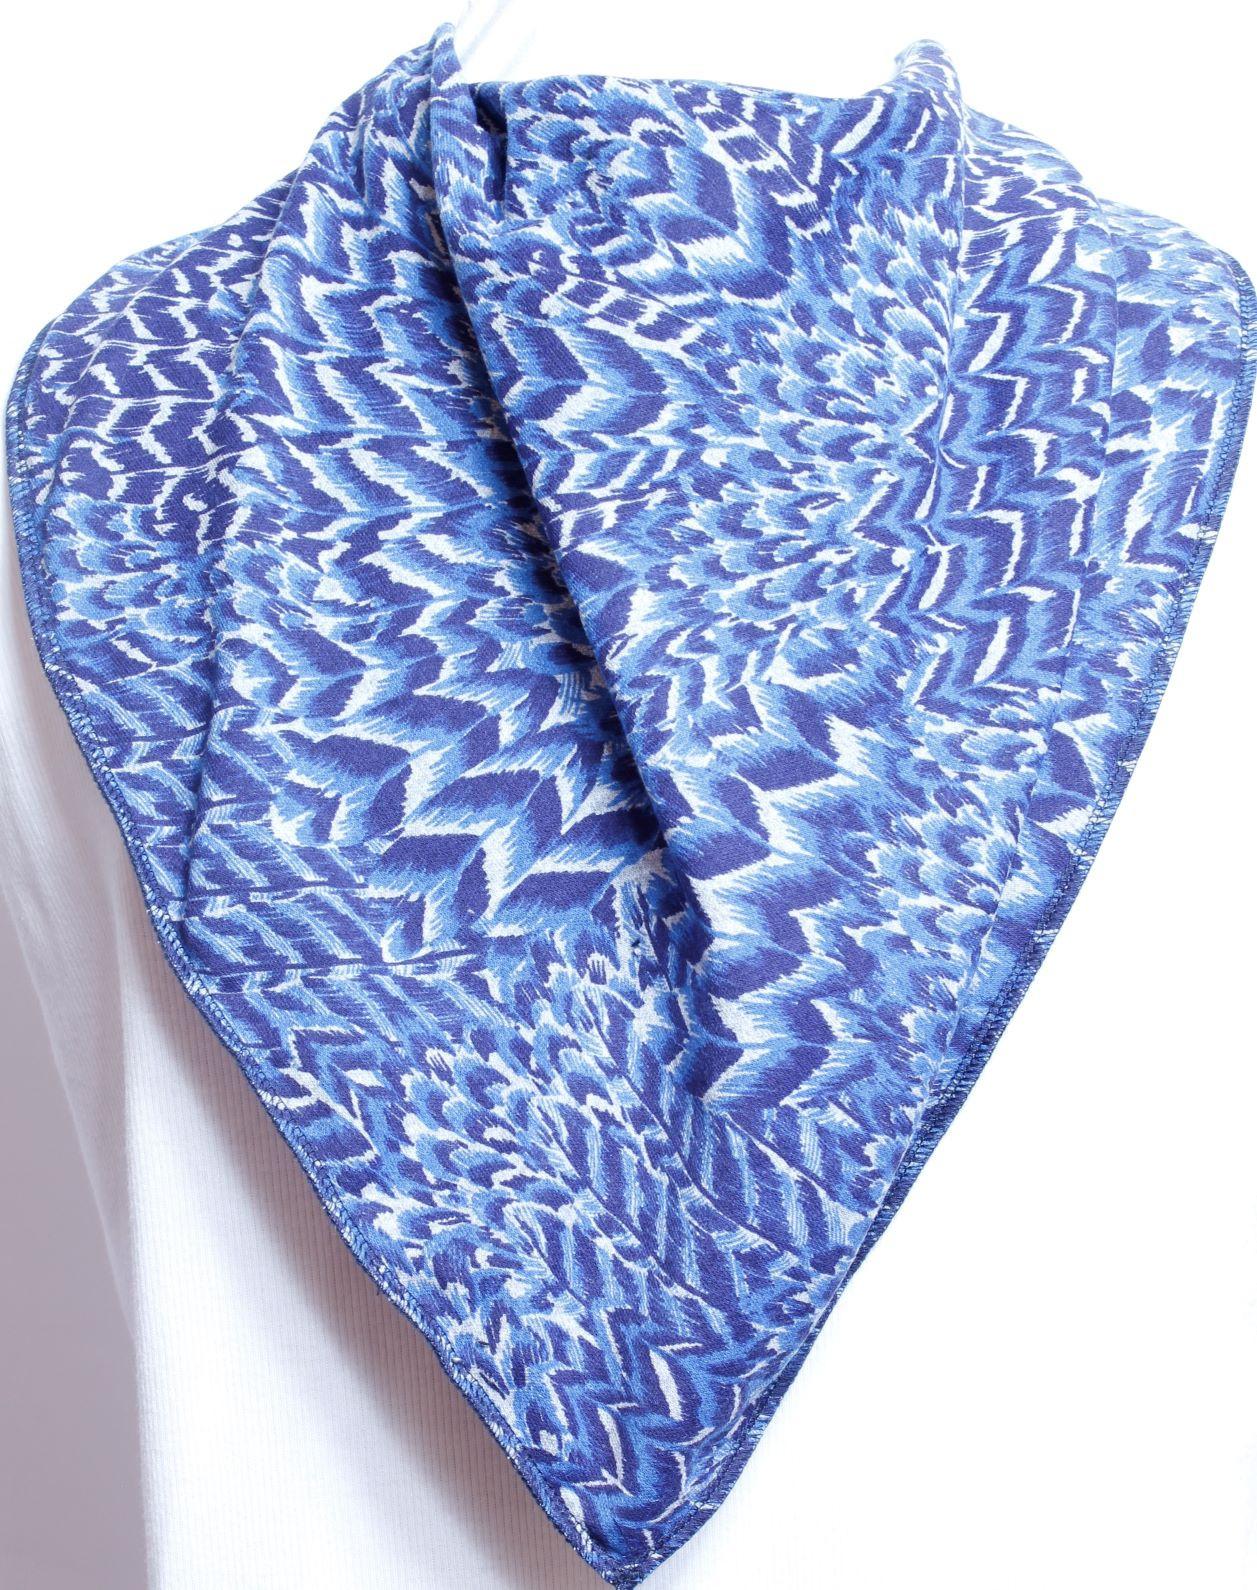 Peacock Tail Bandana Bib - Size 4